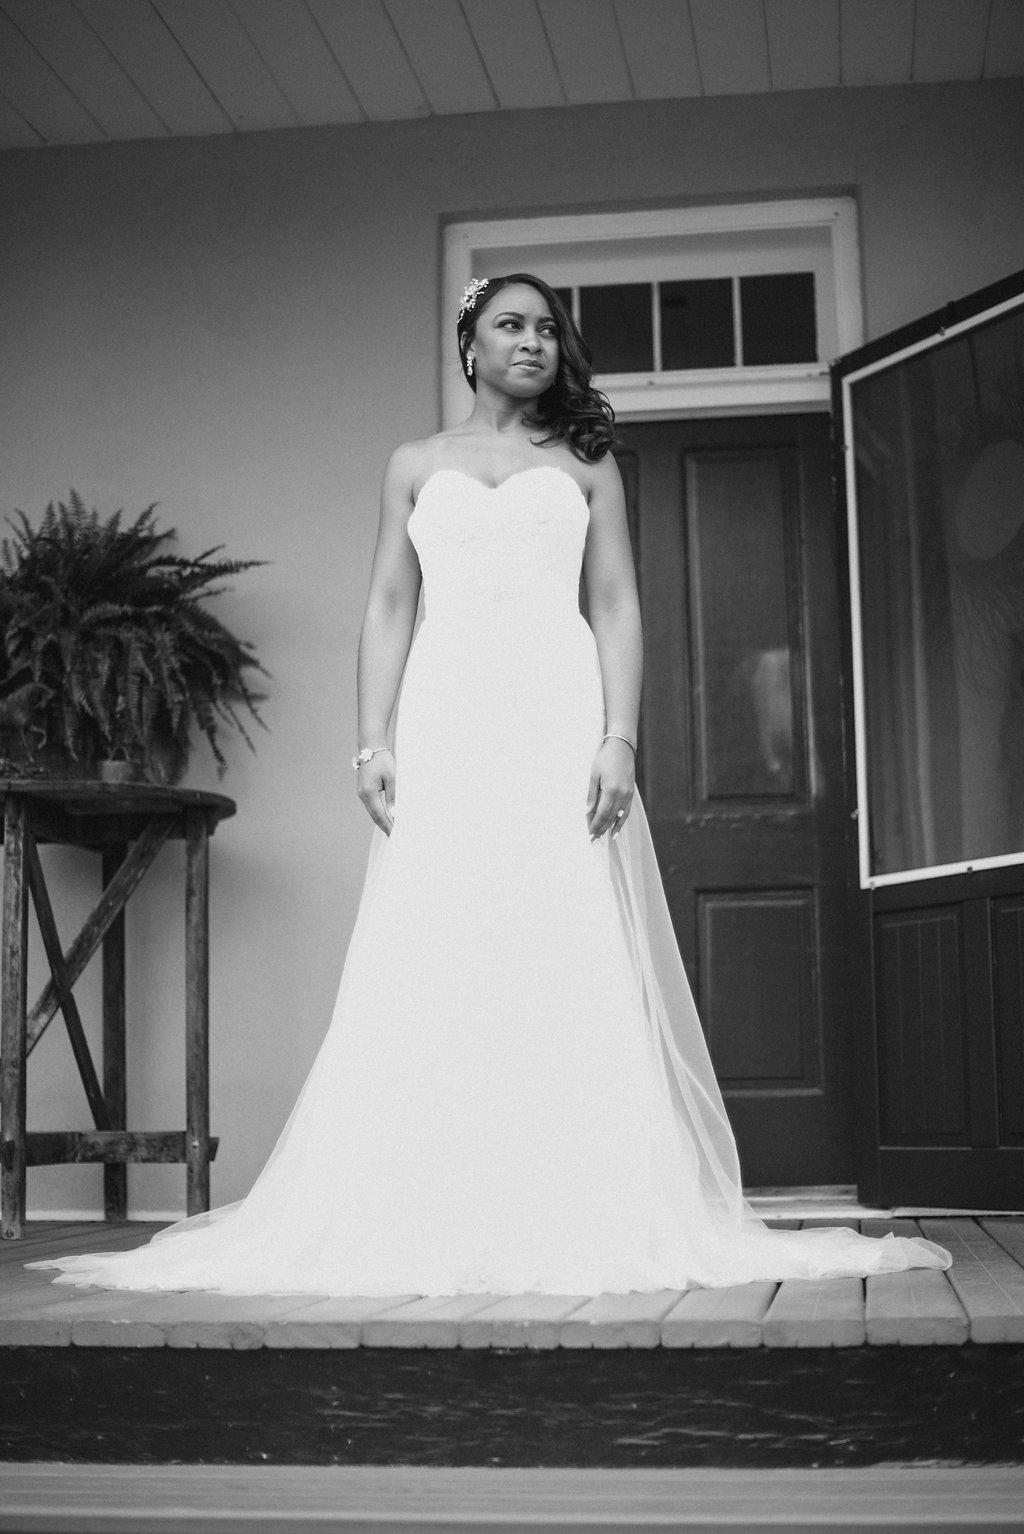 Bride ready for wedding photo